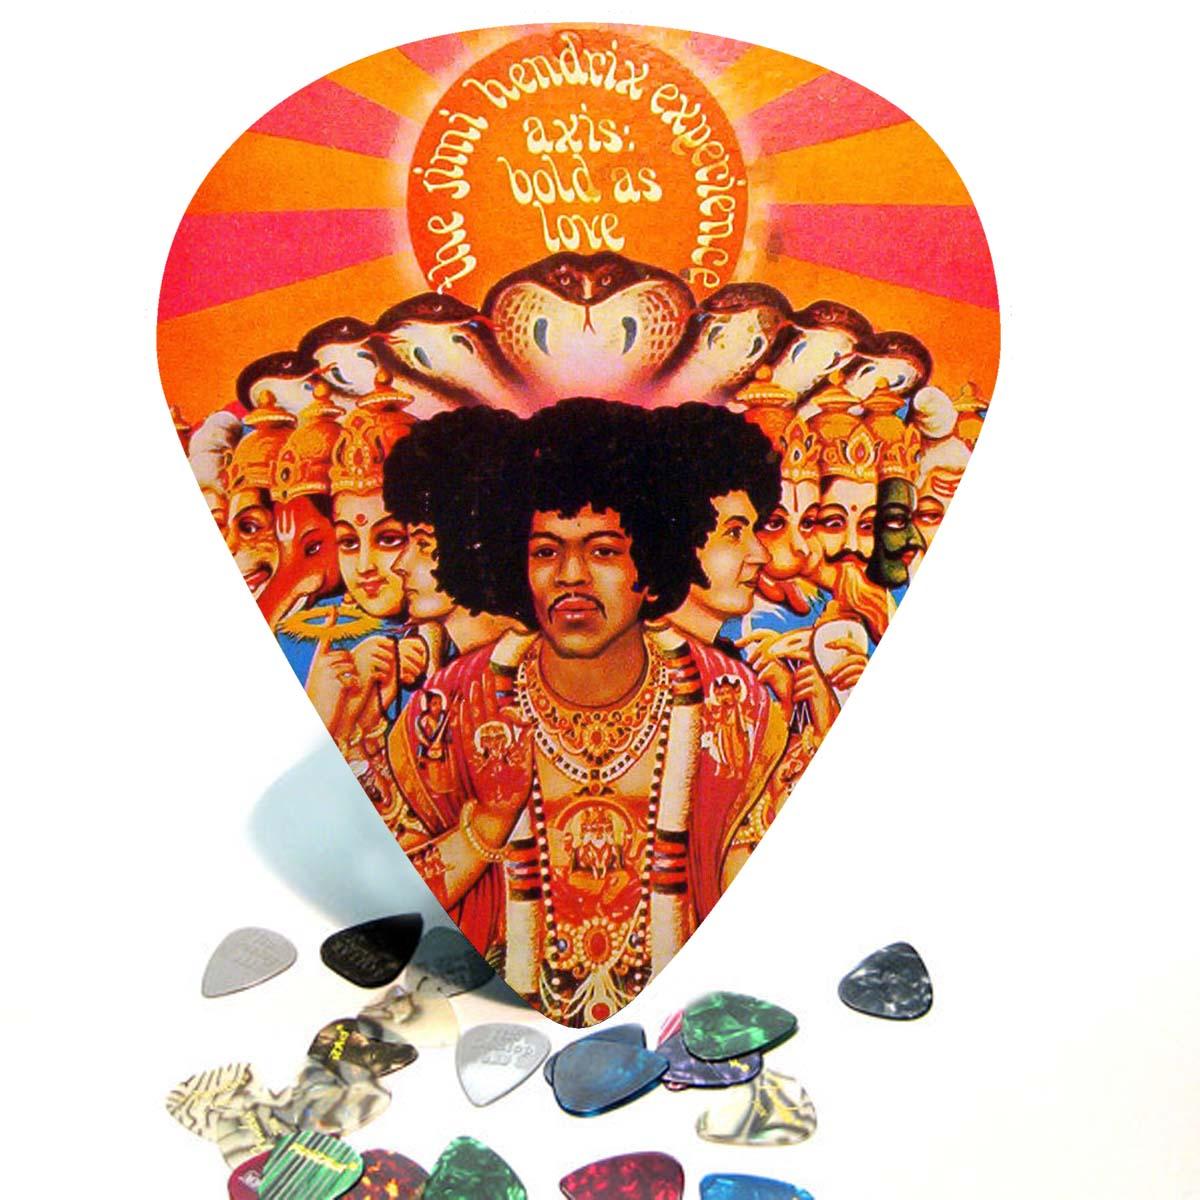 Hendrix Album Cover Giant Guitar Pick Wall Art - 1071